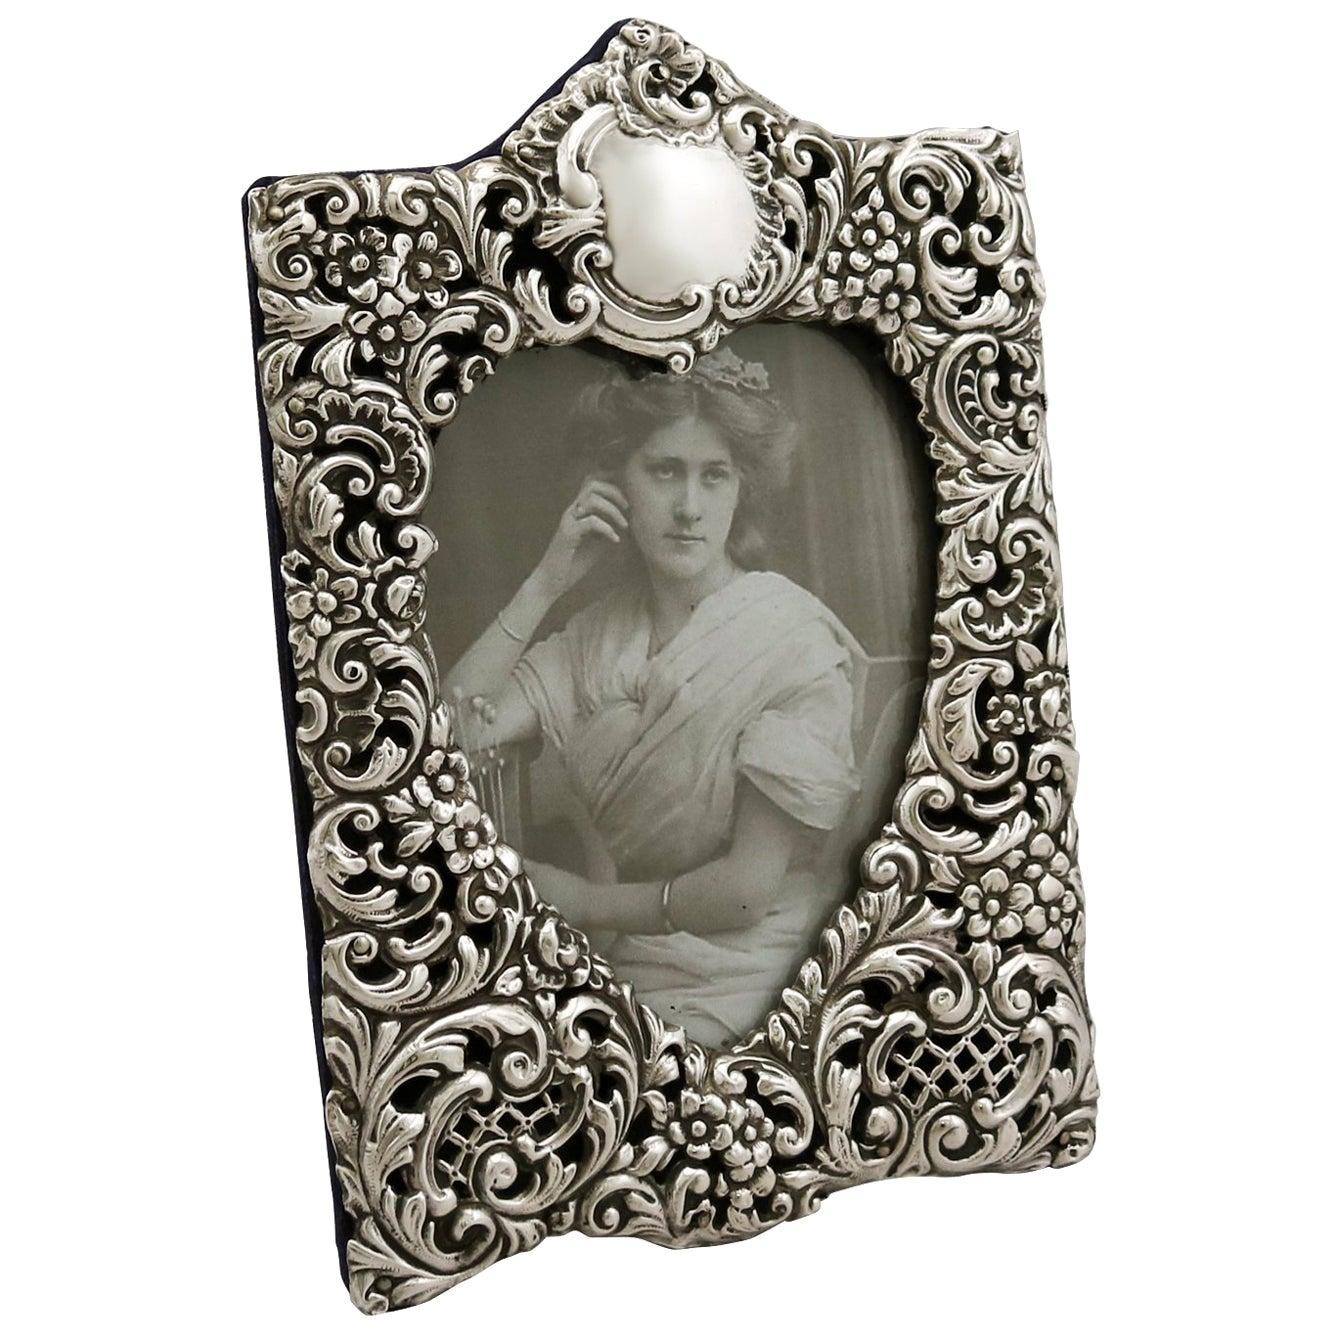 Antique Edwardian Sterling Silver Photograph Frame 1901